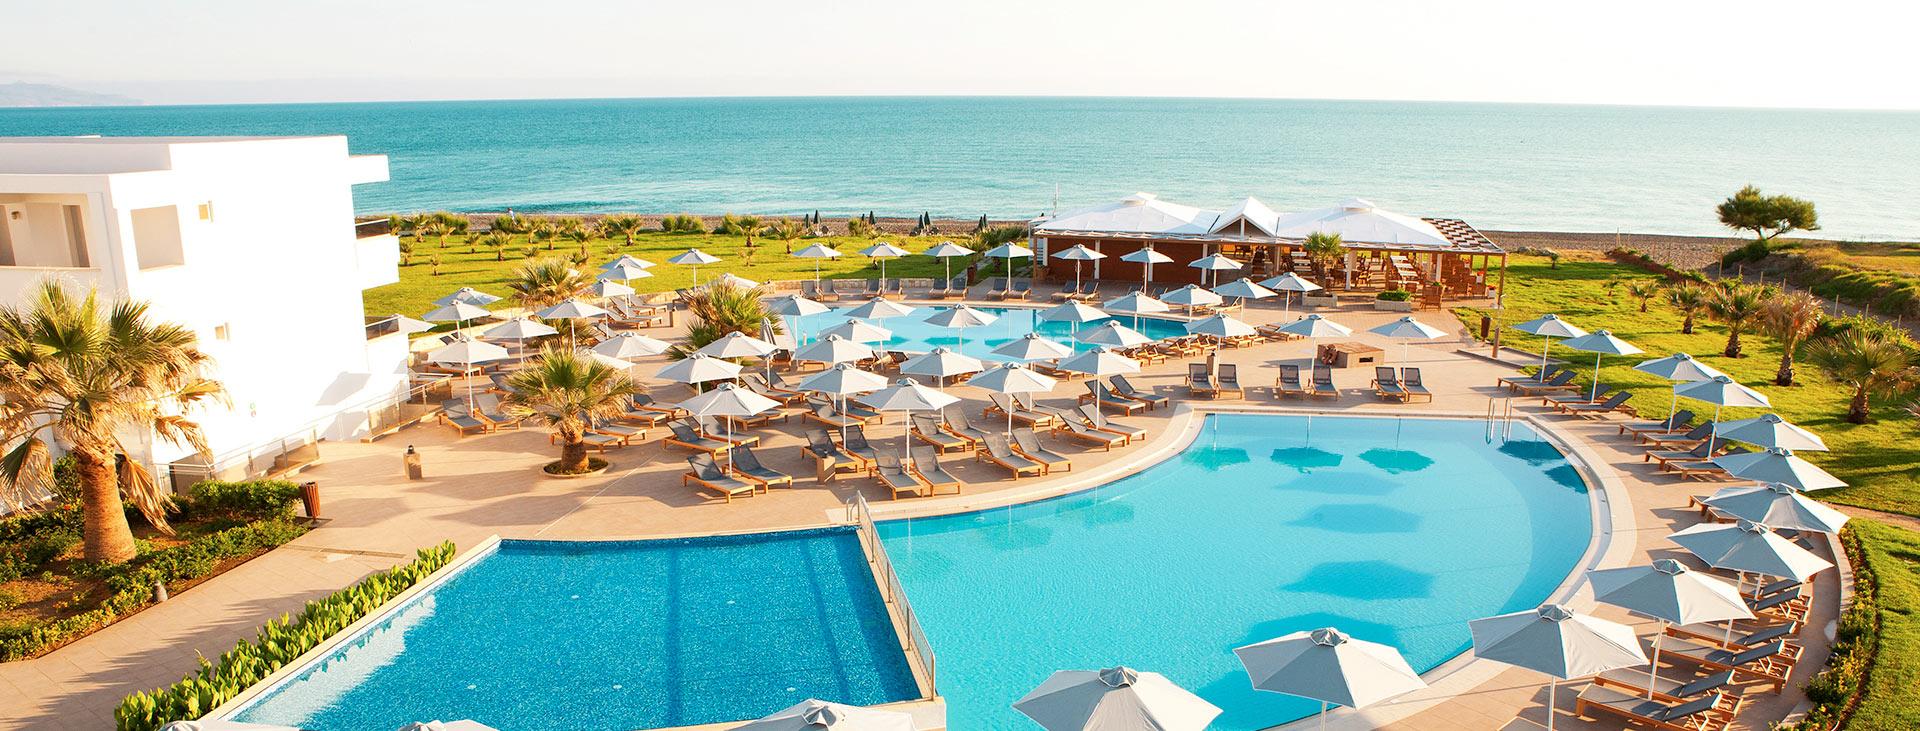 Sunprime Platanias Beach, Hanian rannikko, Platanias, Kreeta, Kreikka